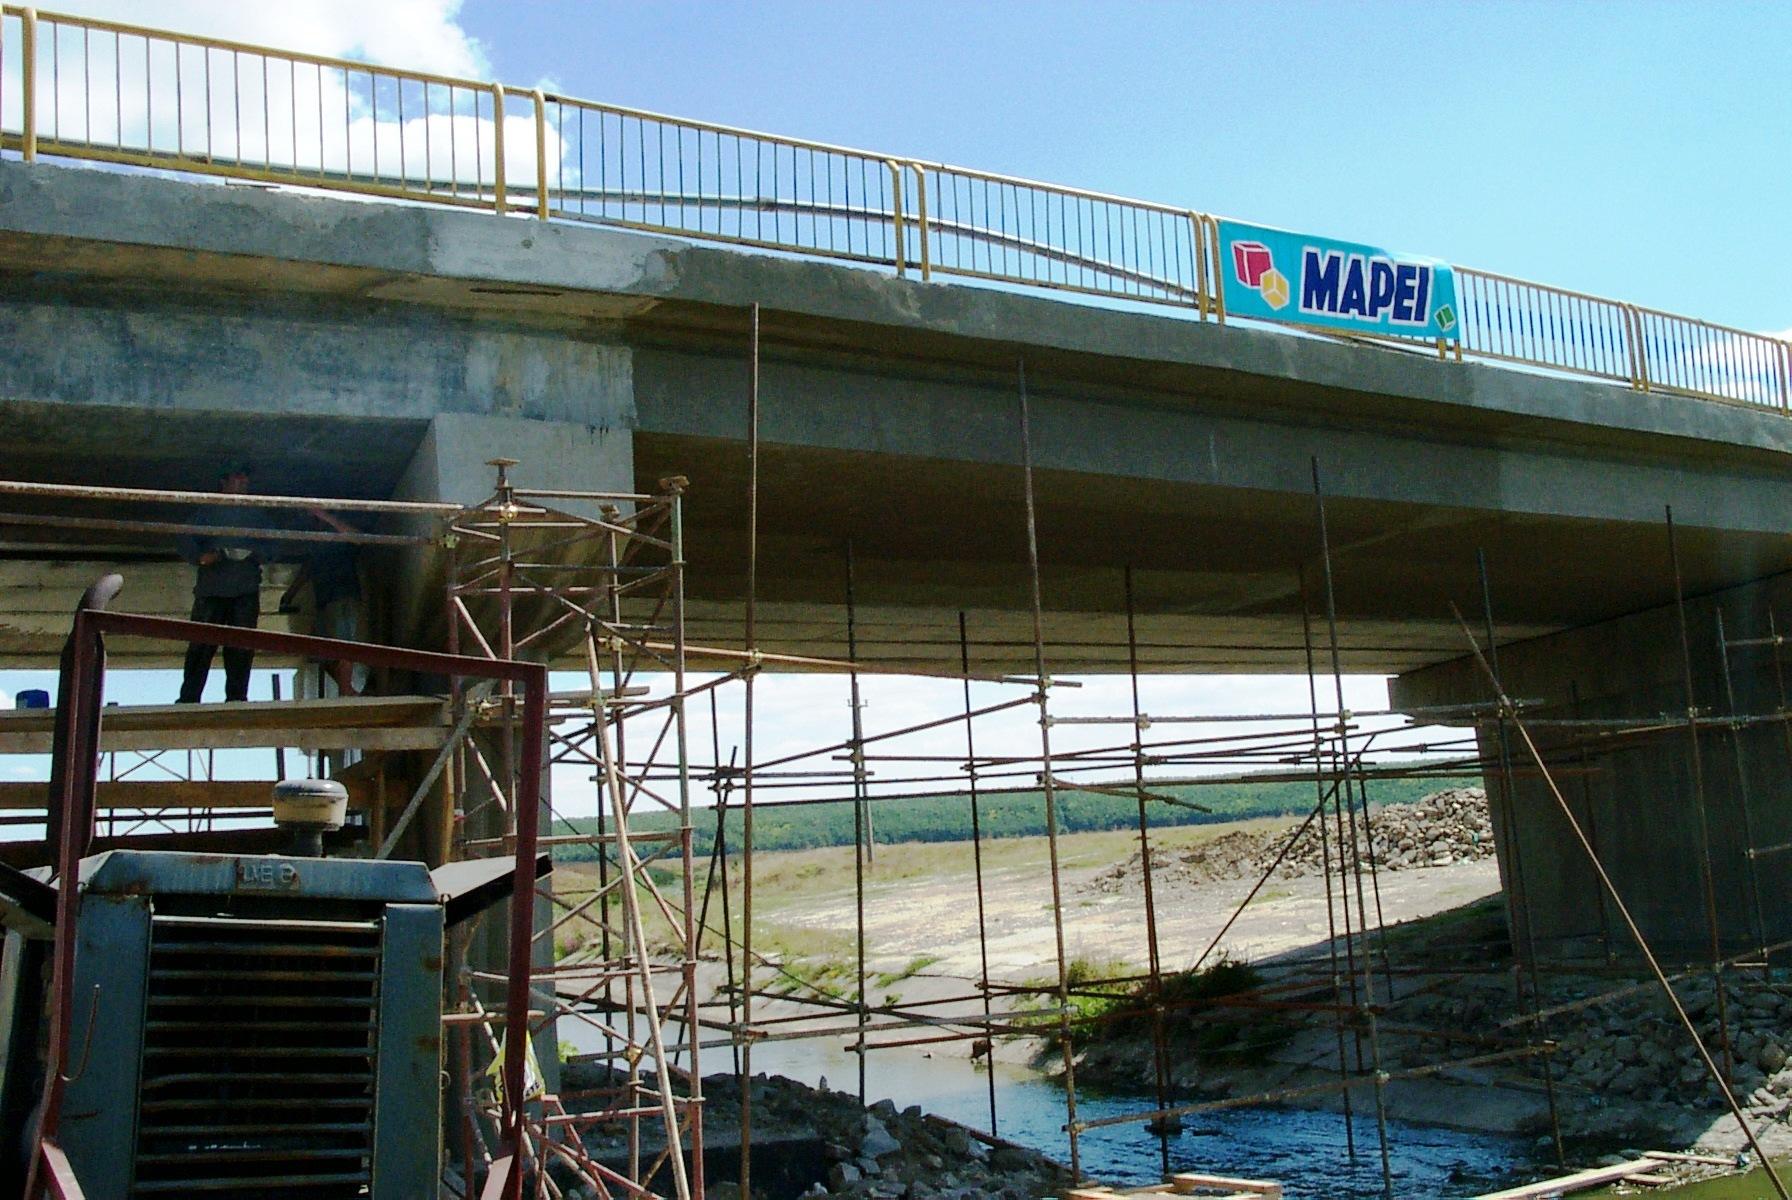 Reparatii pod (DN2), Km. 33 - 028, peste raul Calnistea MAPEI - Poza 105